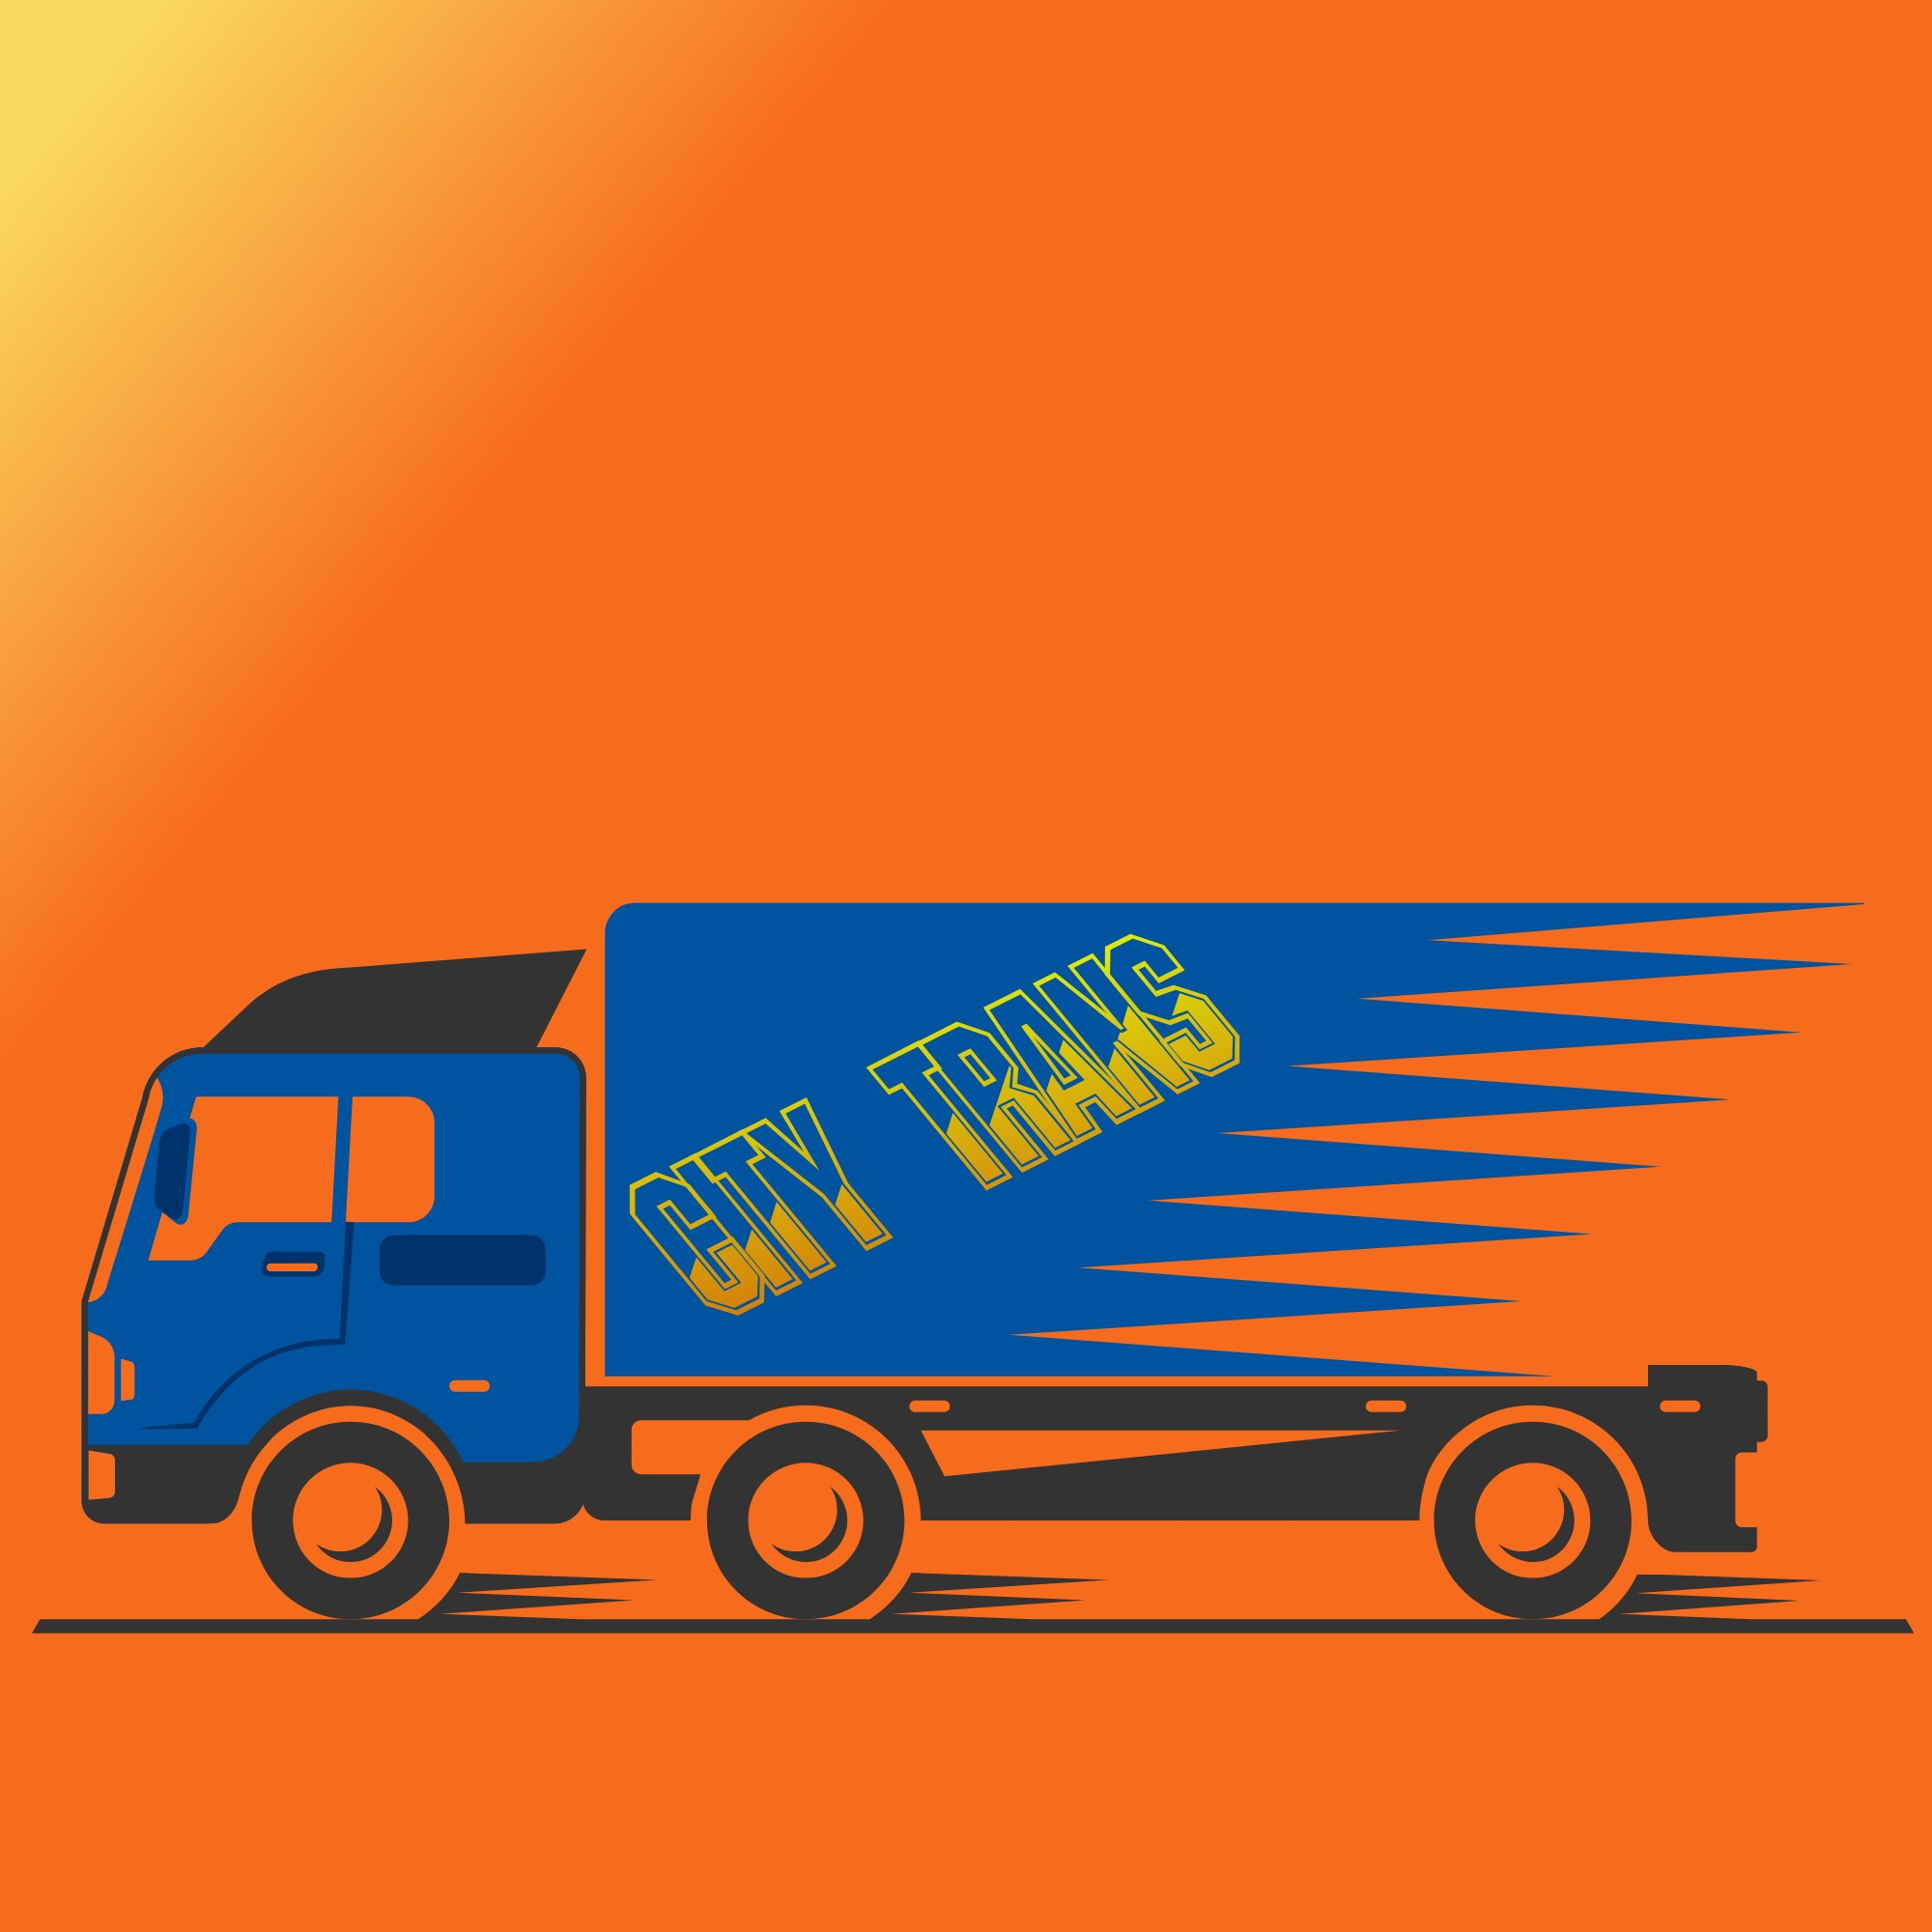 Разработка Логотипа транспортной компании фото f_3275e6ceb0a870ce.jpg